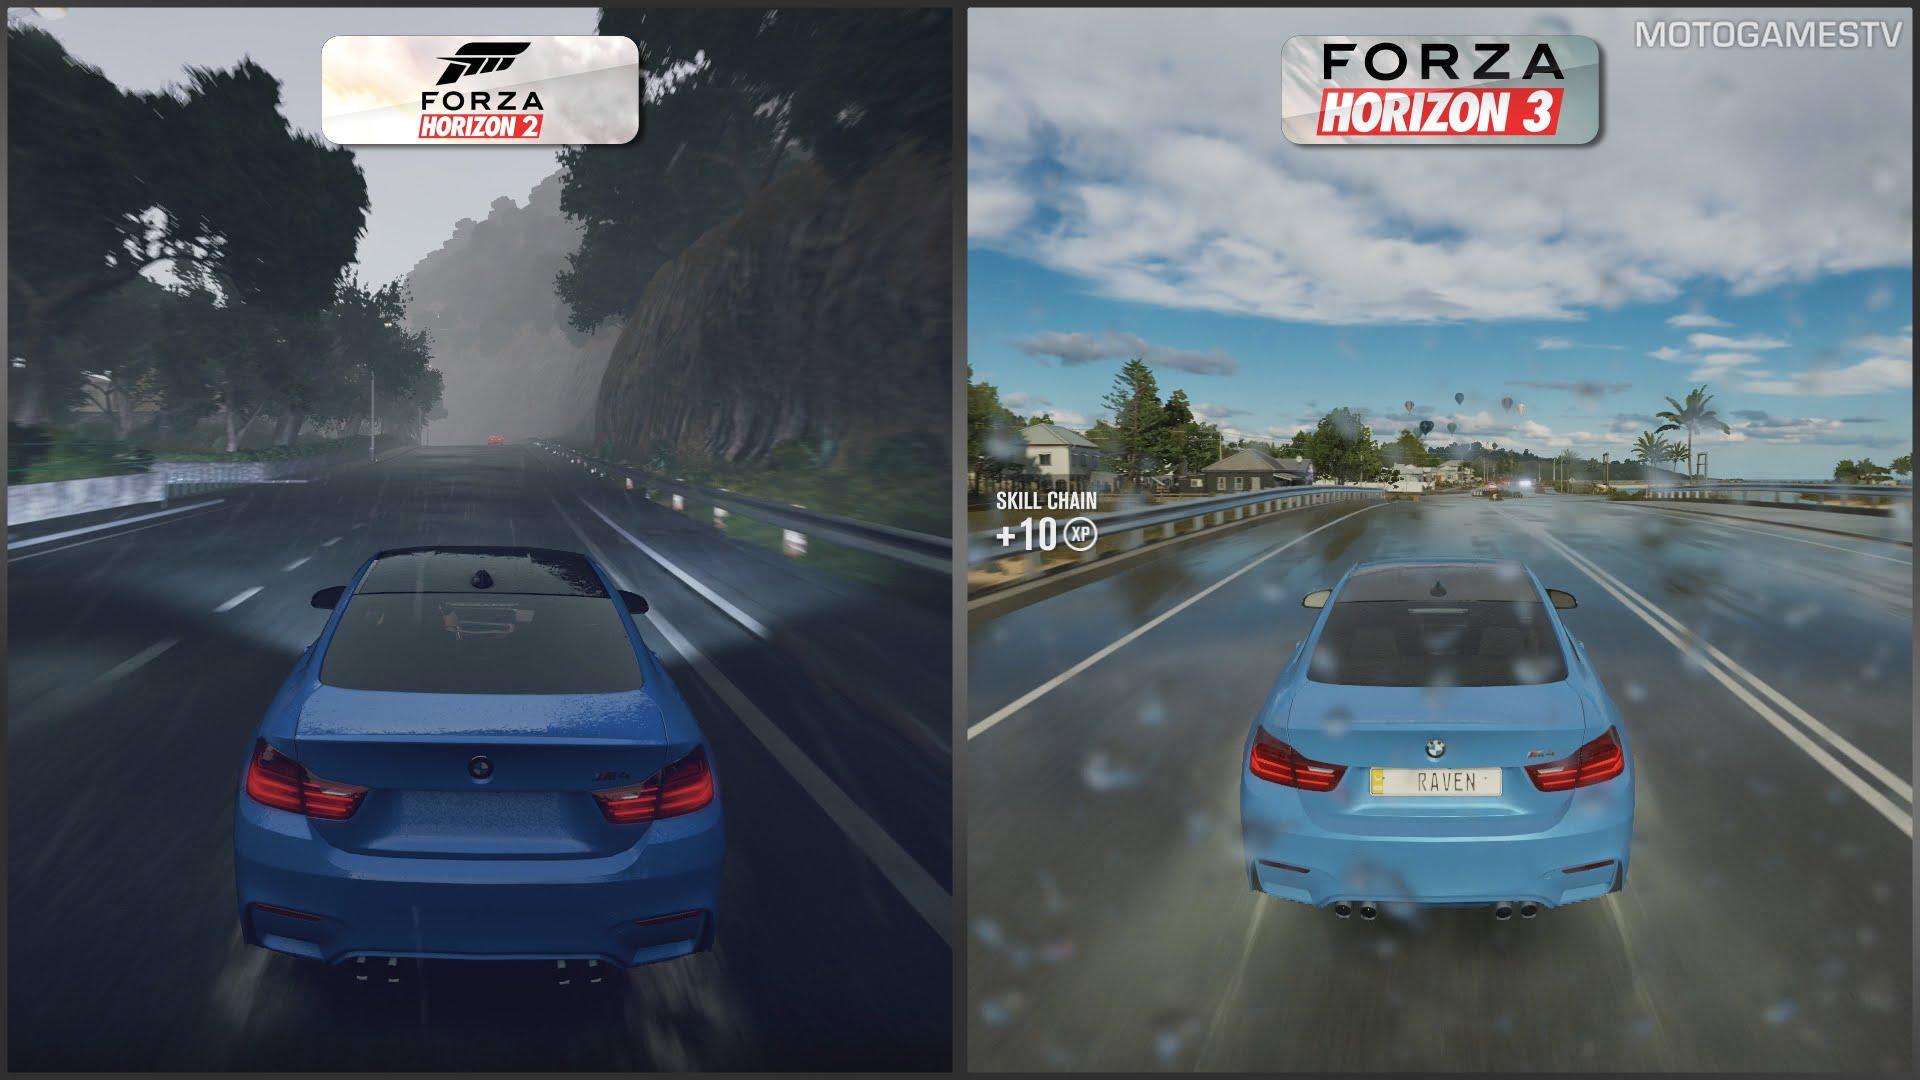 Forza Horizon 3 VS Forza Horizon 2 - Which do you prefer and why?